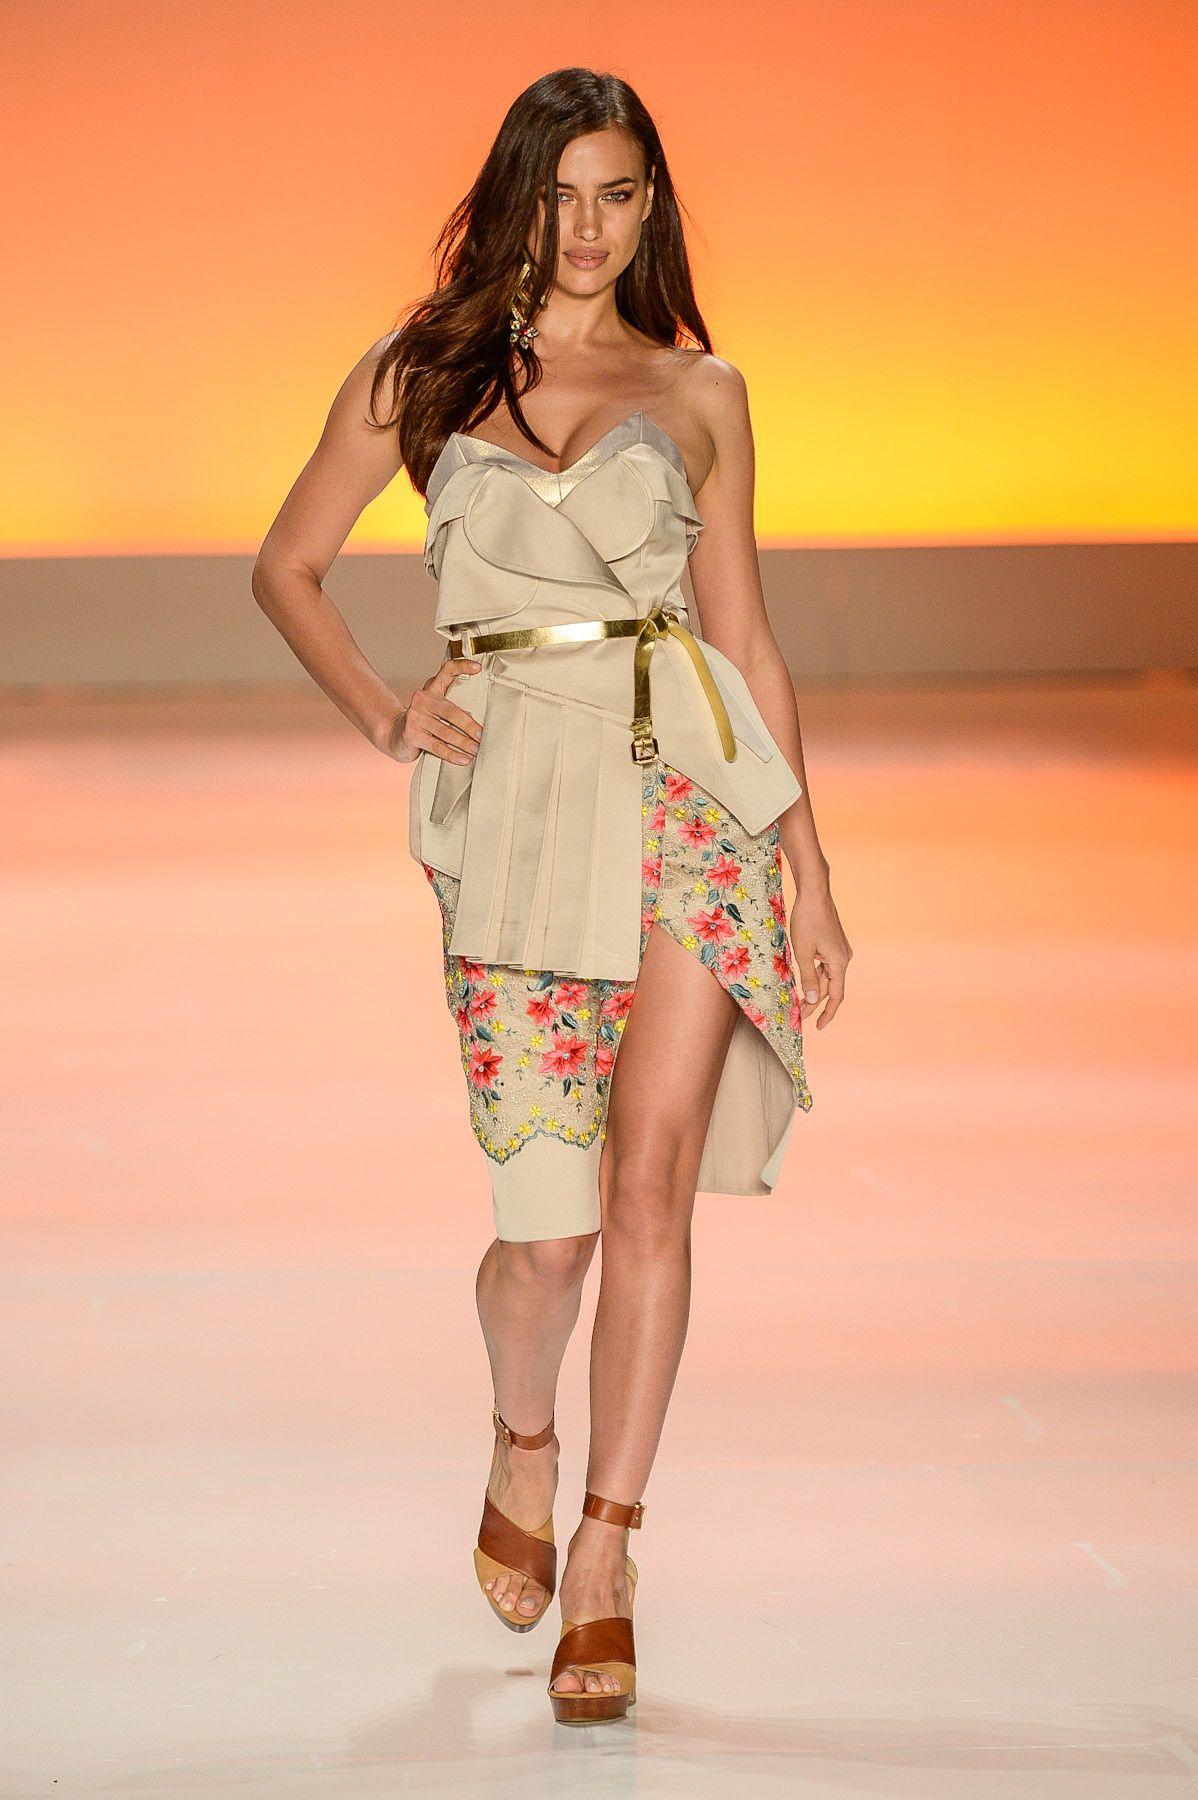 dbeb18aa1 Triton | São Paulo | Verão 2015 RTW summer fashion Irina Shayk <333 ...